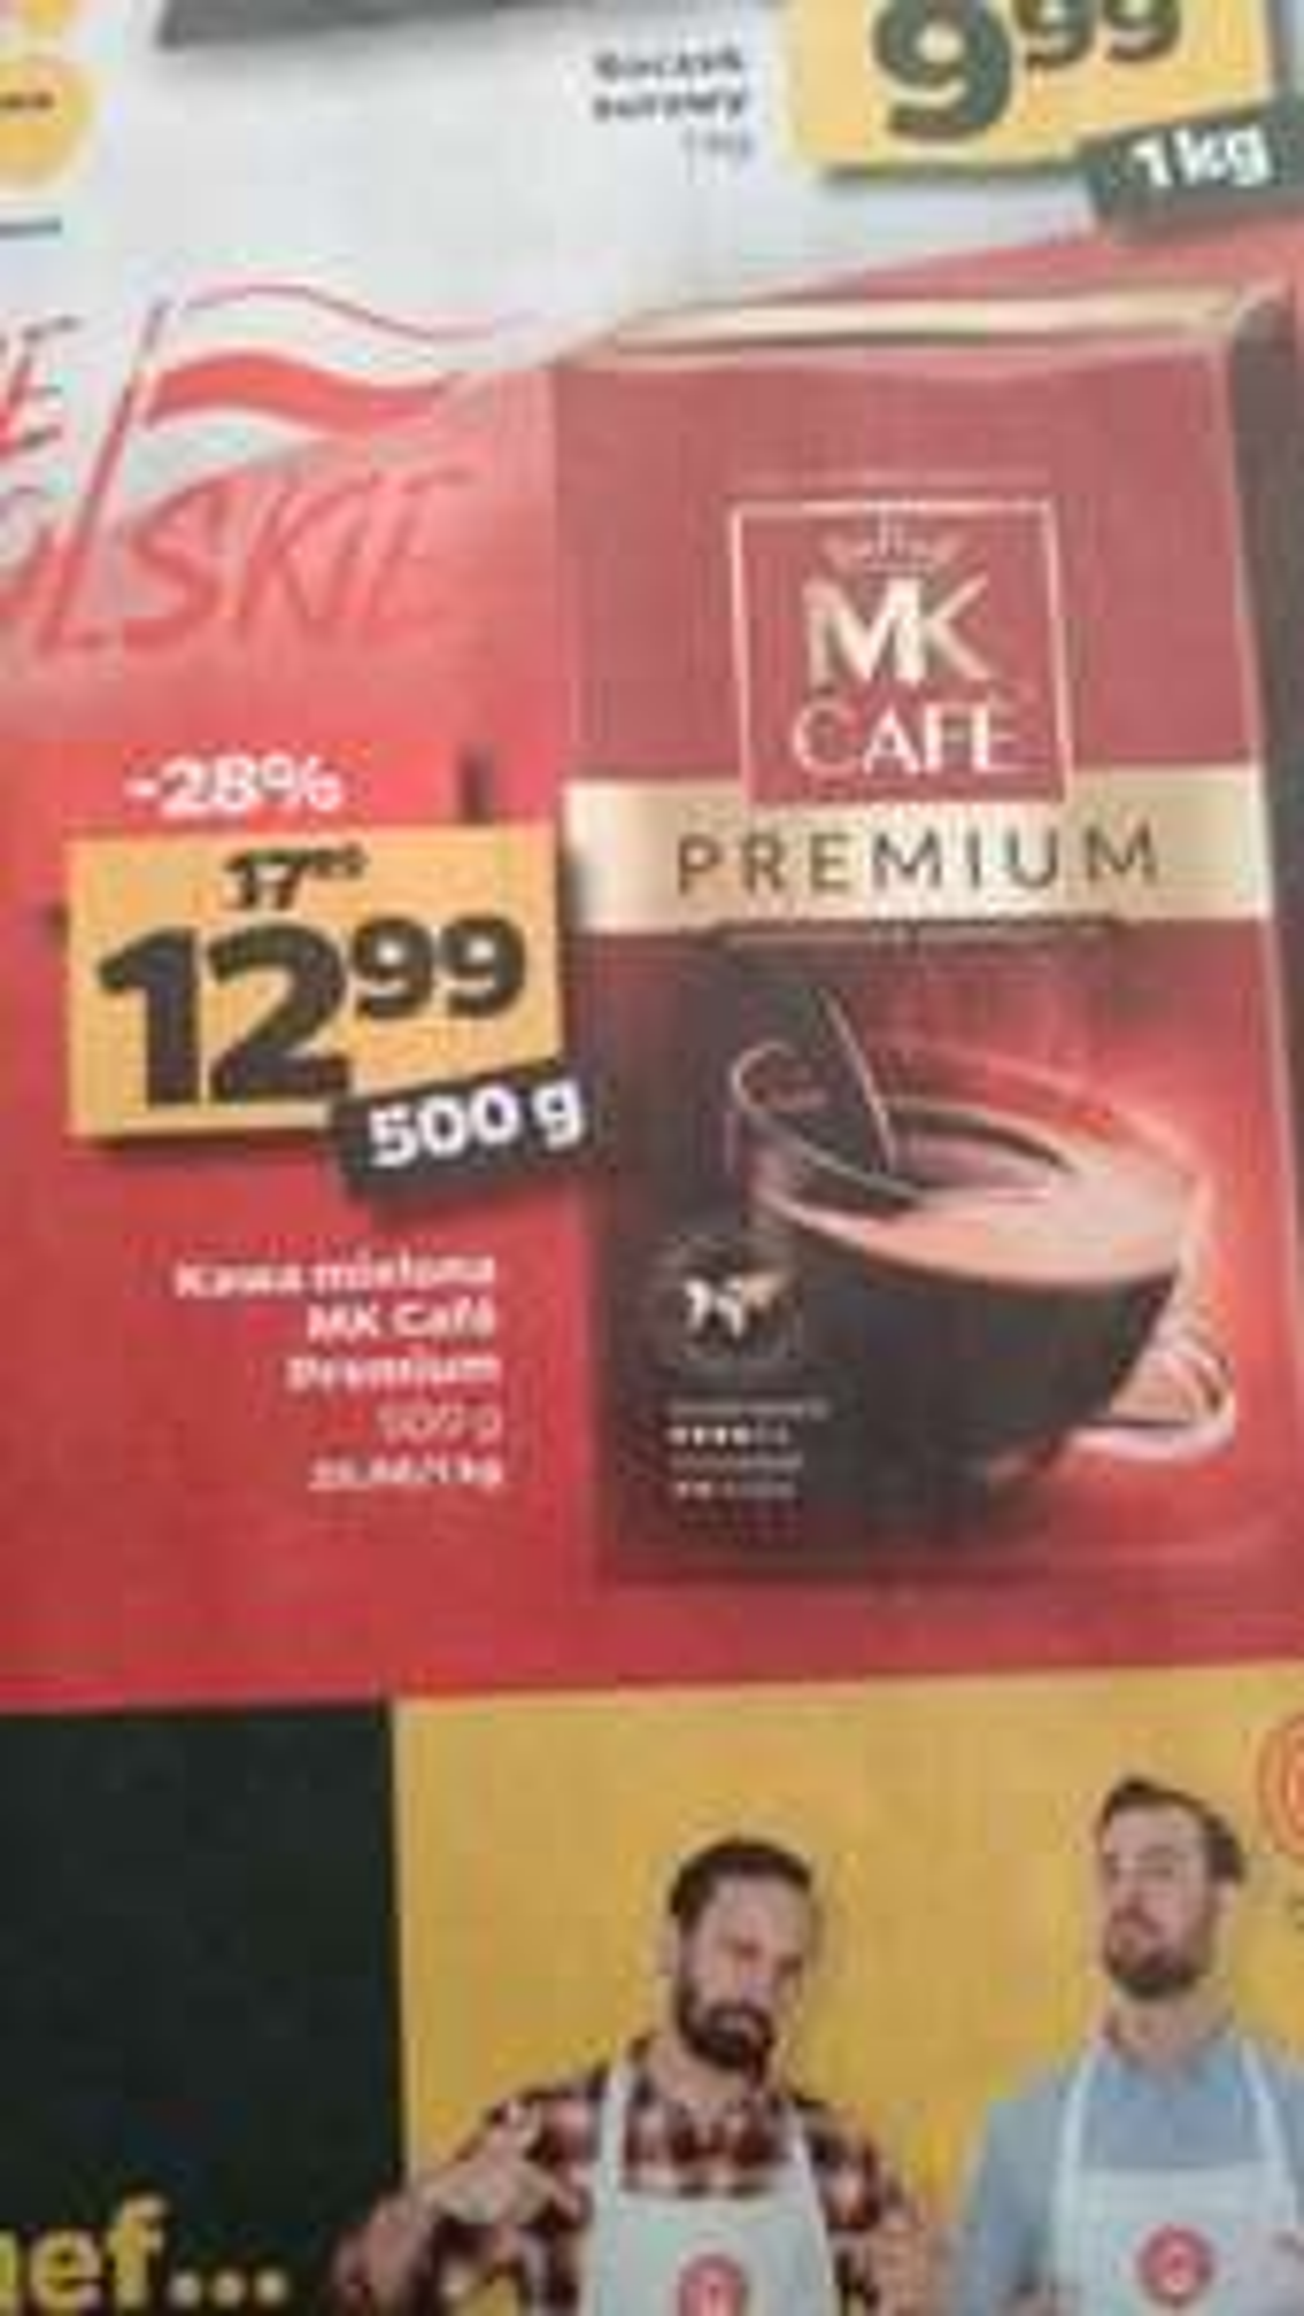 Kawa MK Cafe Premium mielona 500g w Netto